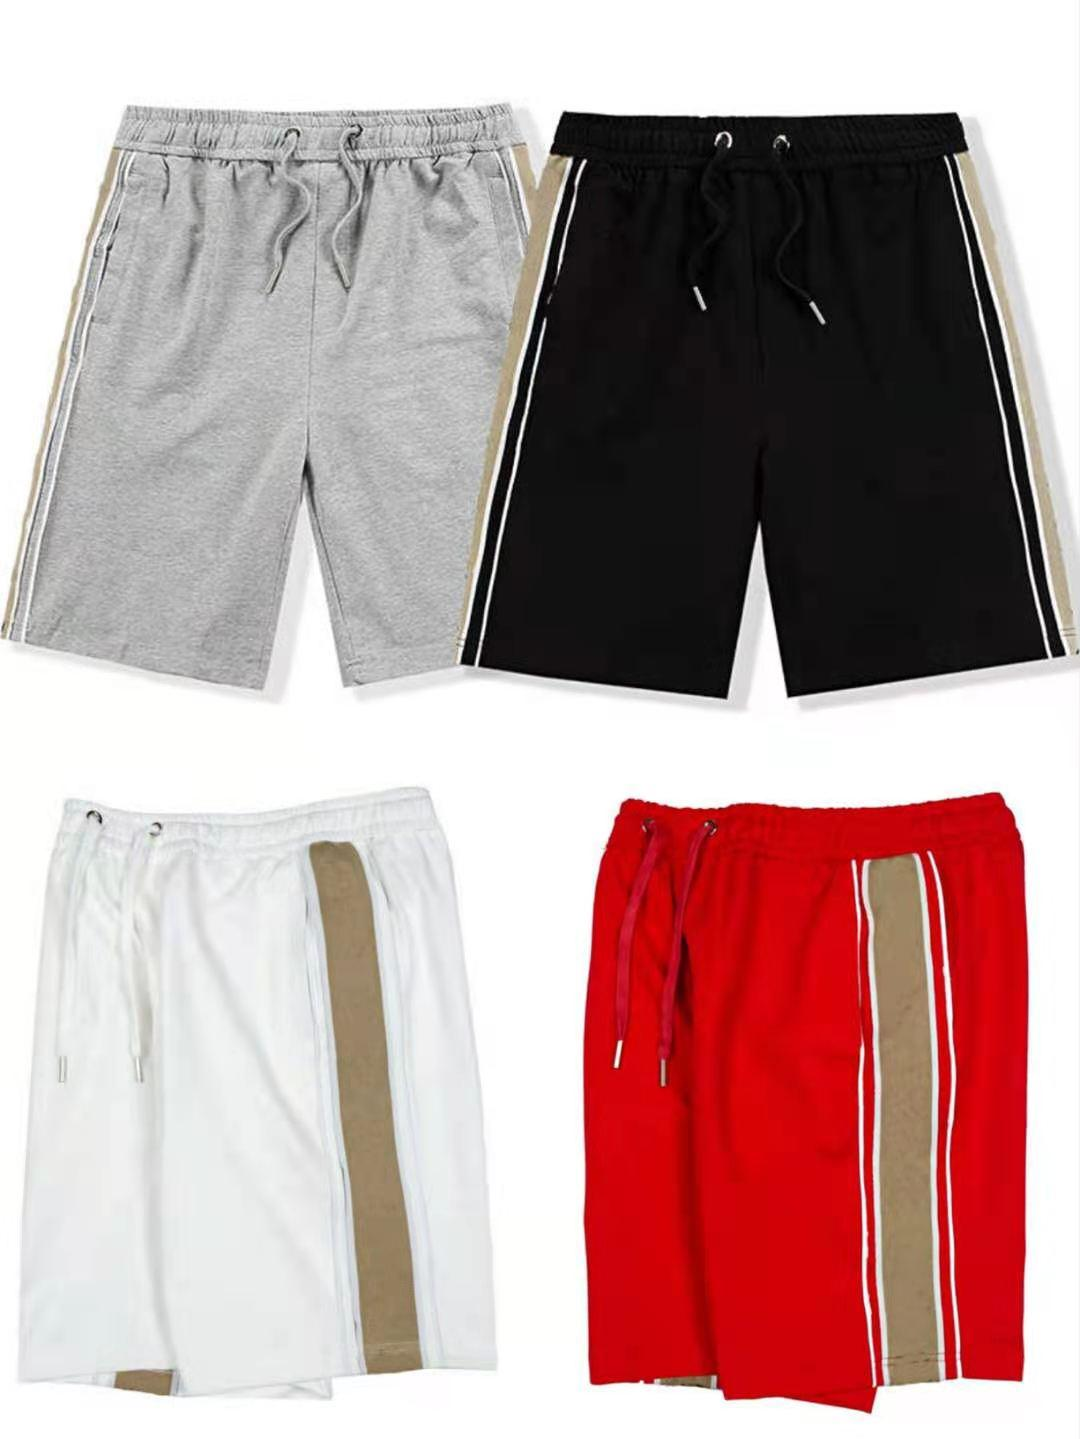 Pantaloncini da uomo estate Pantaloni ricamati Pantaloni moda classica All-match Summer maschile Pantaloncini Dimensioni M-XXL